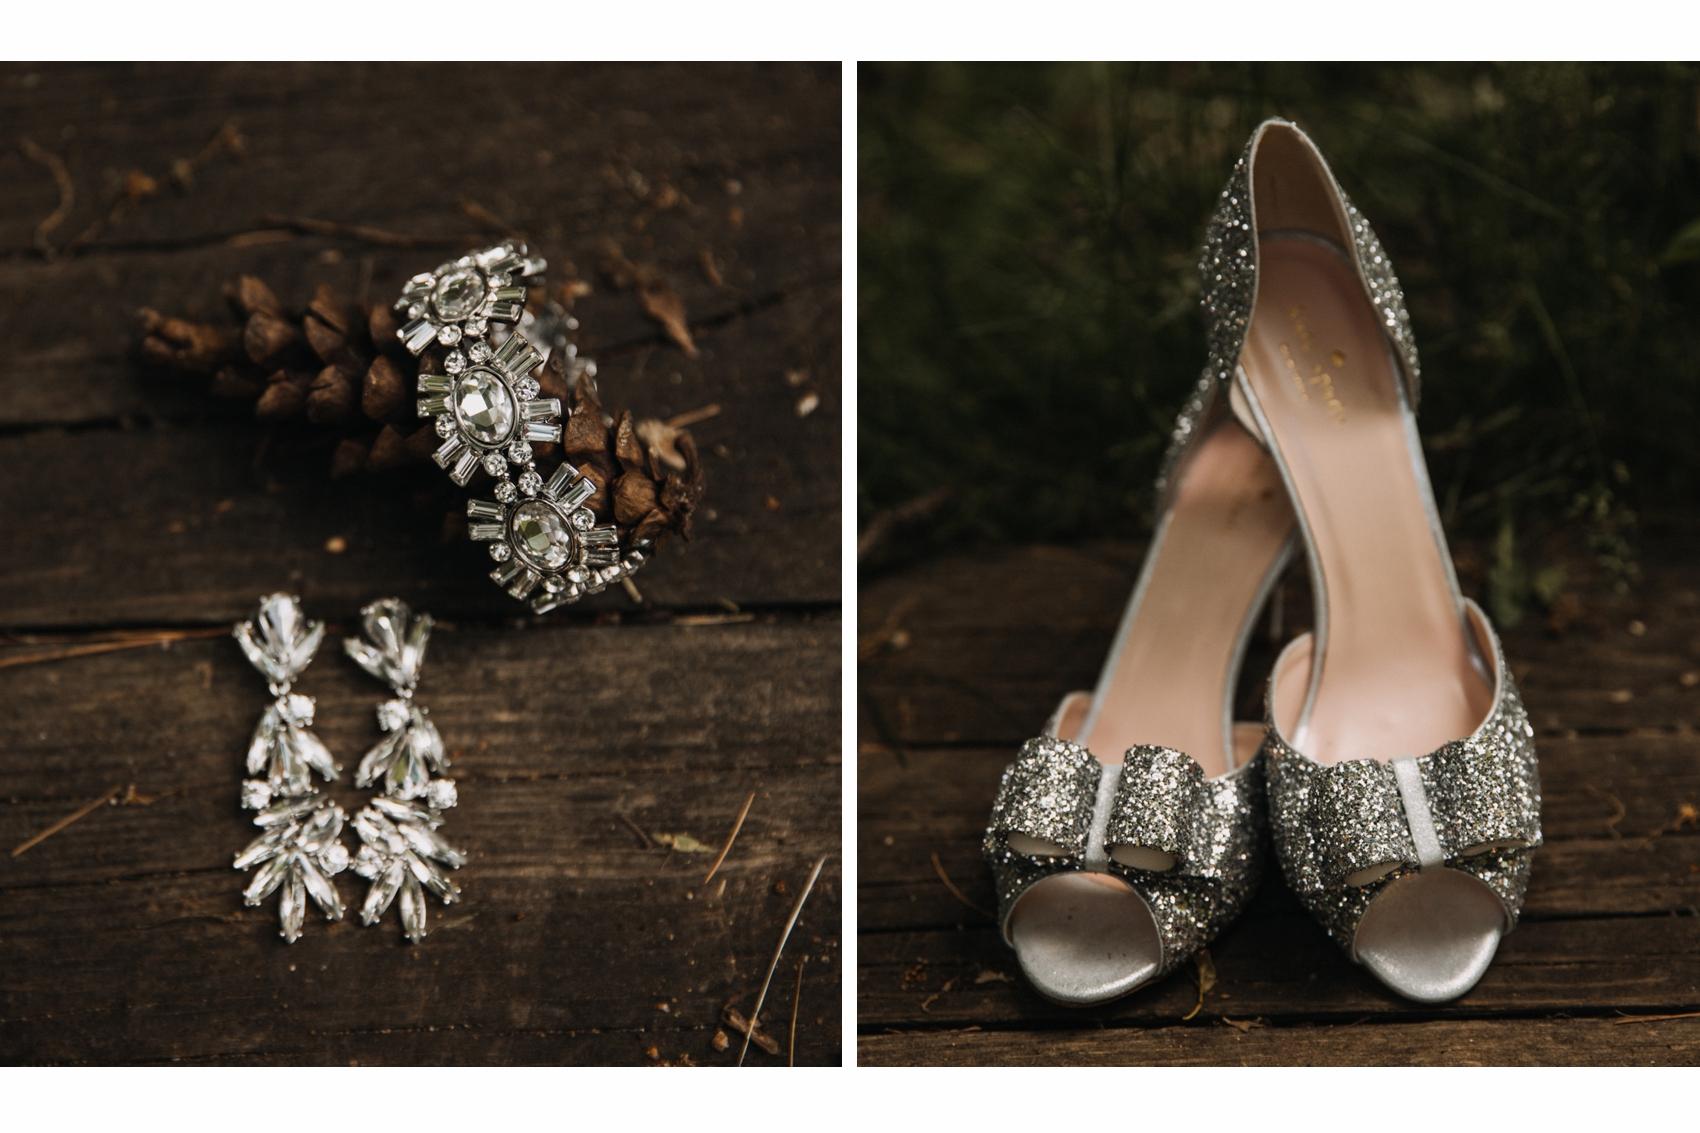 silver-bowtie-heals-bride-style.jpg